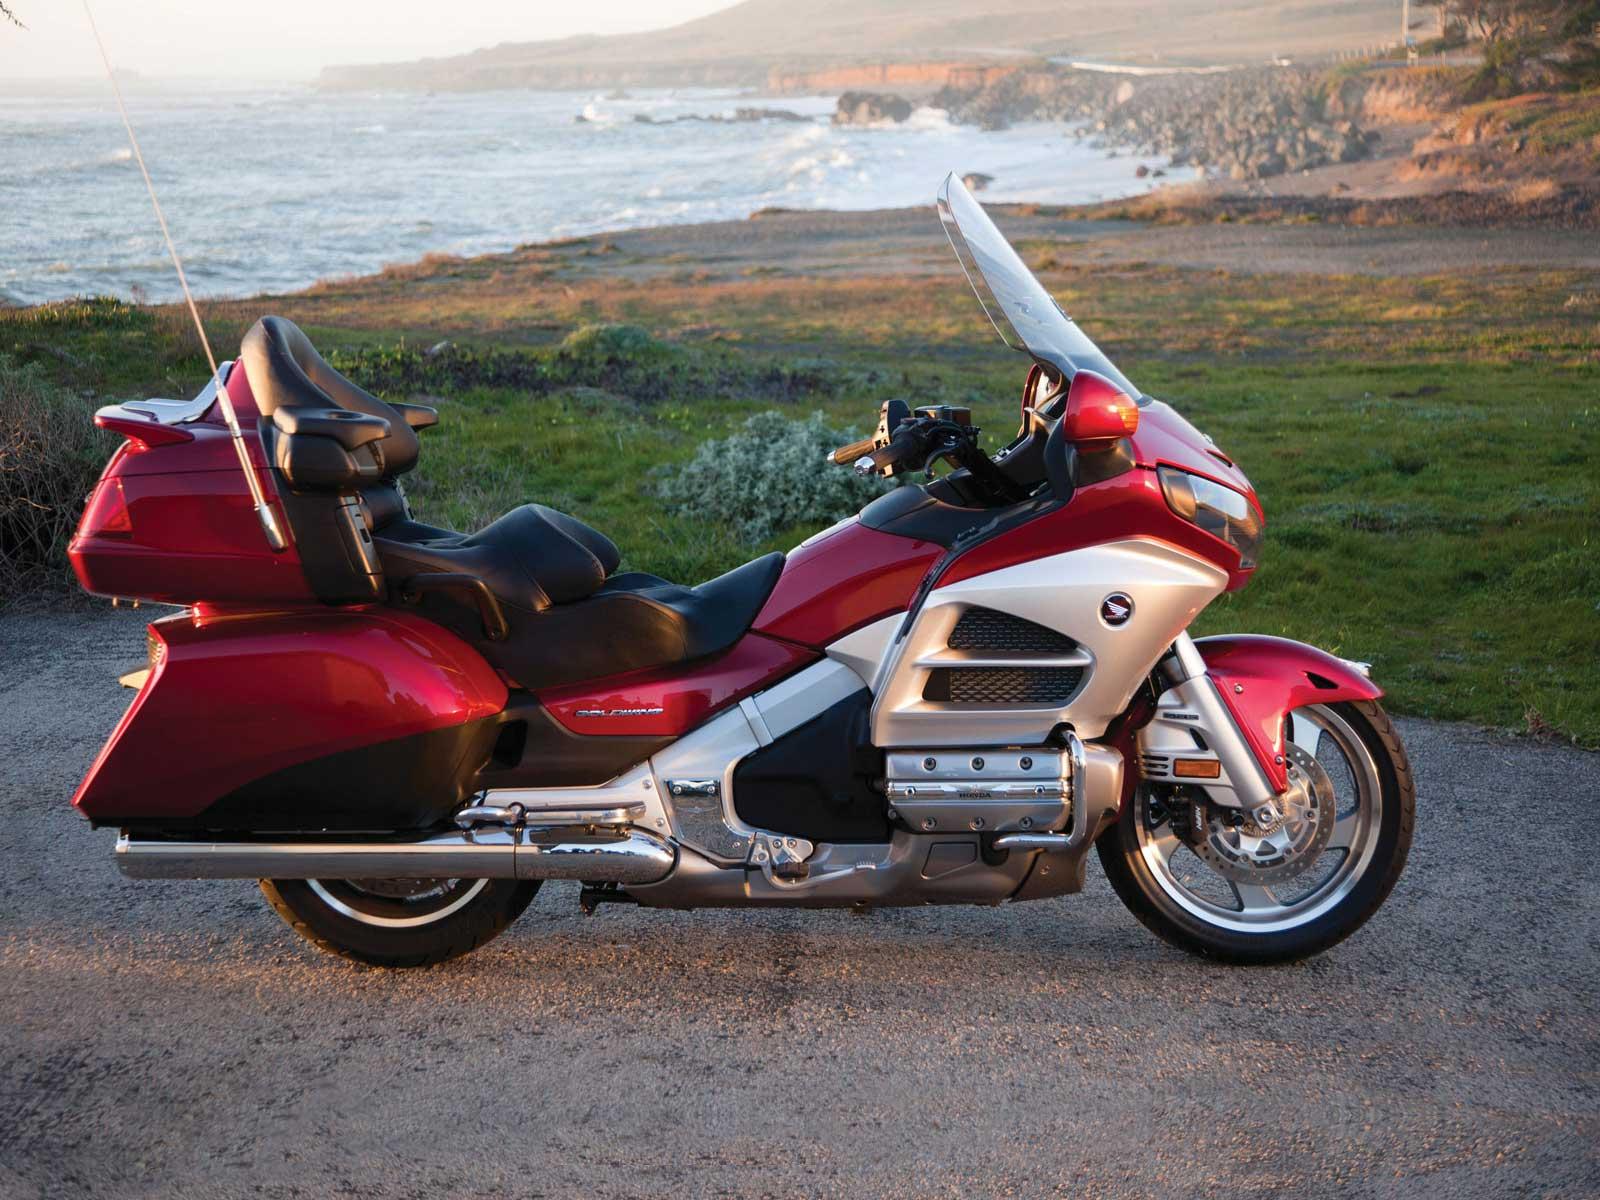 Gold Wing Gl1800 Audio Comfort Navigation Xm Abs 2012 Honda